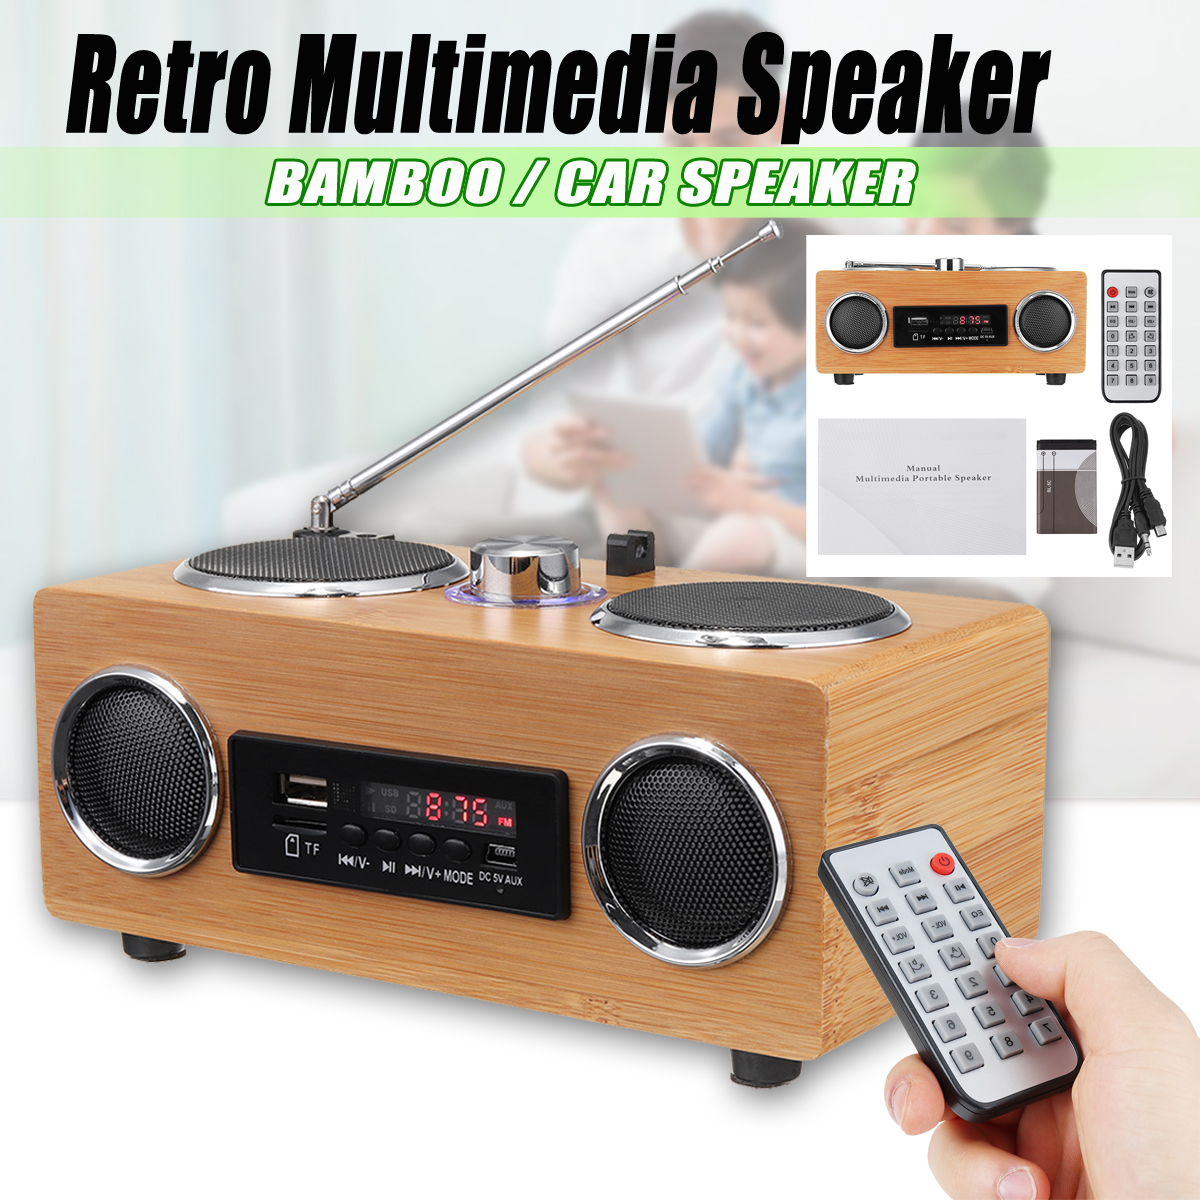 Retro Vintage Radio Super Bass FM Radio Bamboo Multimedia Speaker Classical Receiver USB With MP3 Player Remote Control tivdio v 116 fm mw sw dsp shortwave transistor radio receiver multiband mp3 player sleep timer alarm clock f9206a